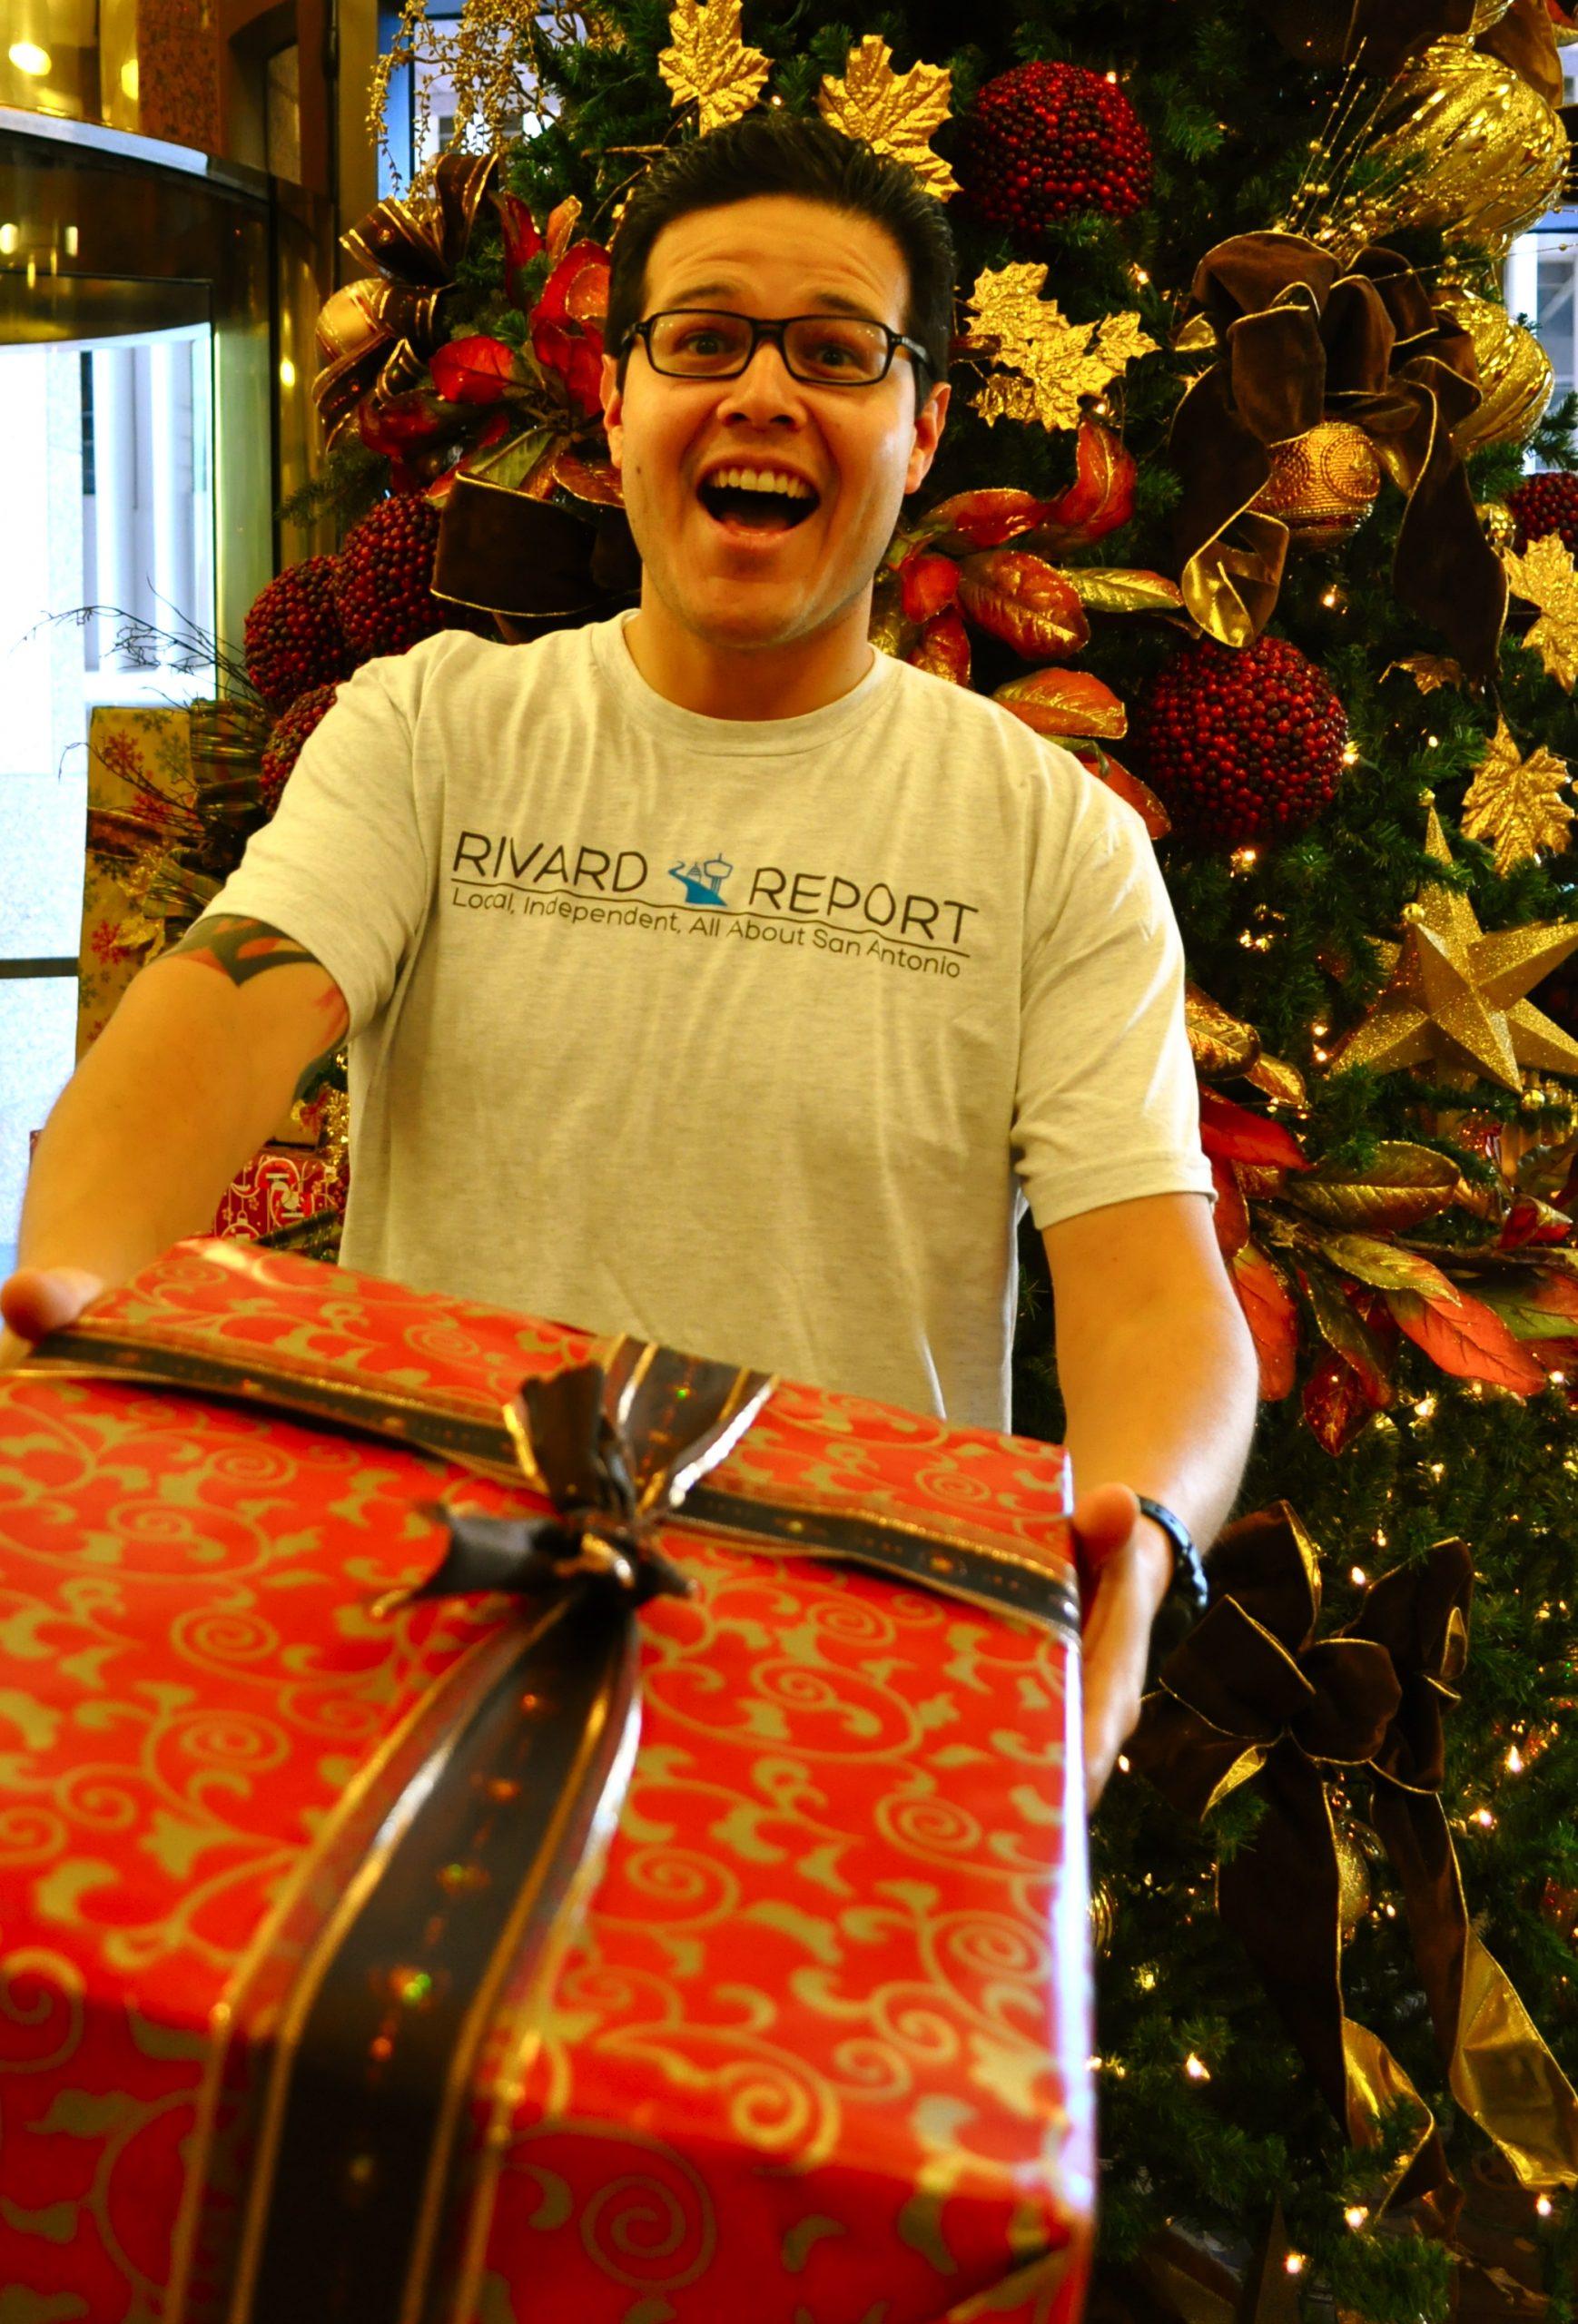 Eddie Romero shows off his Rivard Report T-shirt